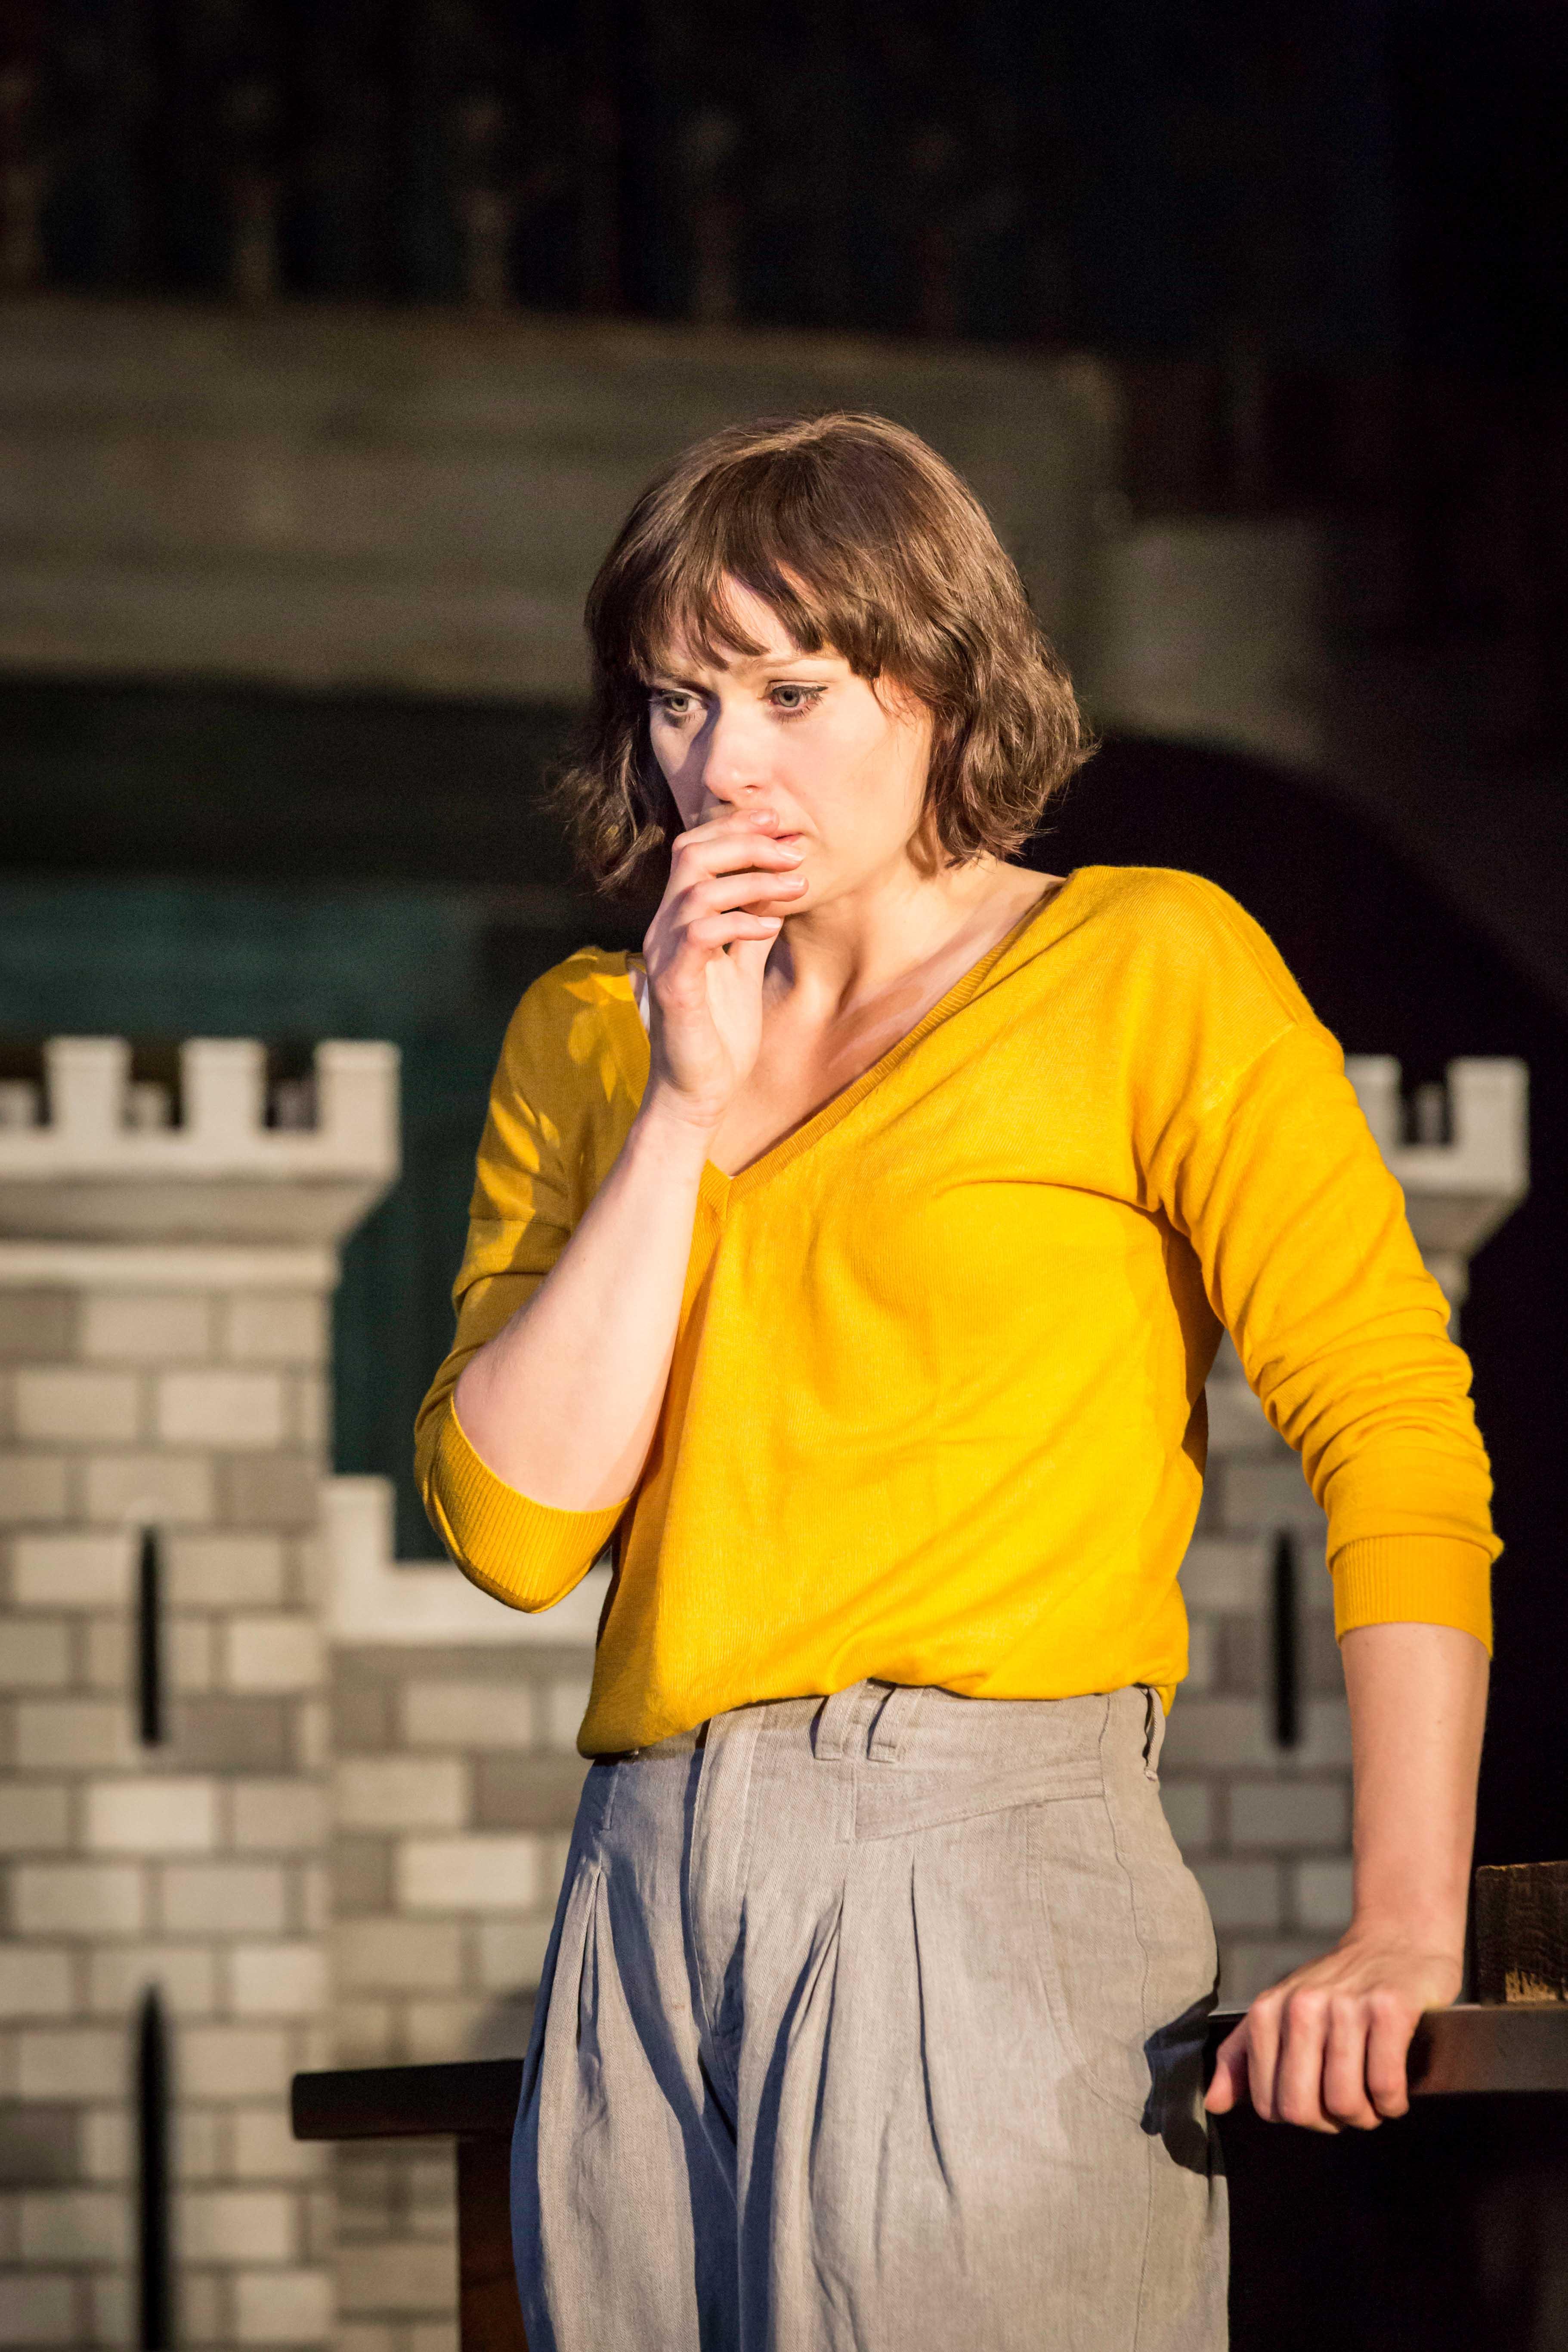 Siân Brooke as Ophelia in Hamletat the Barbican theatre